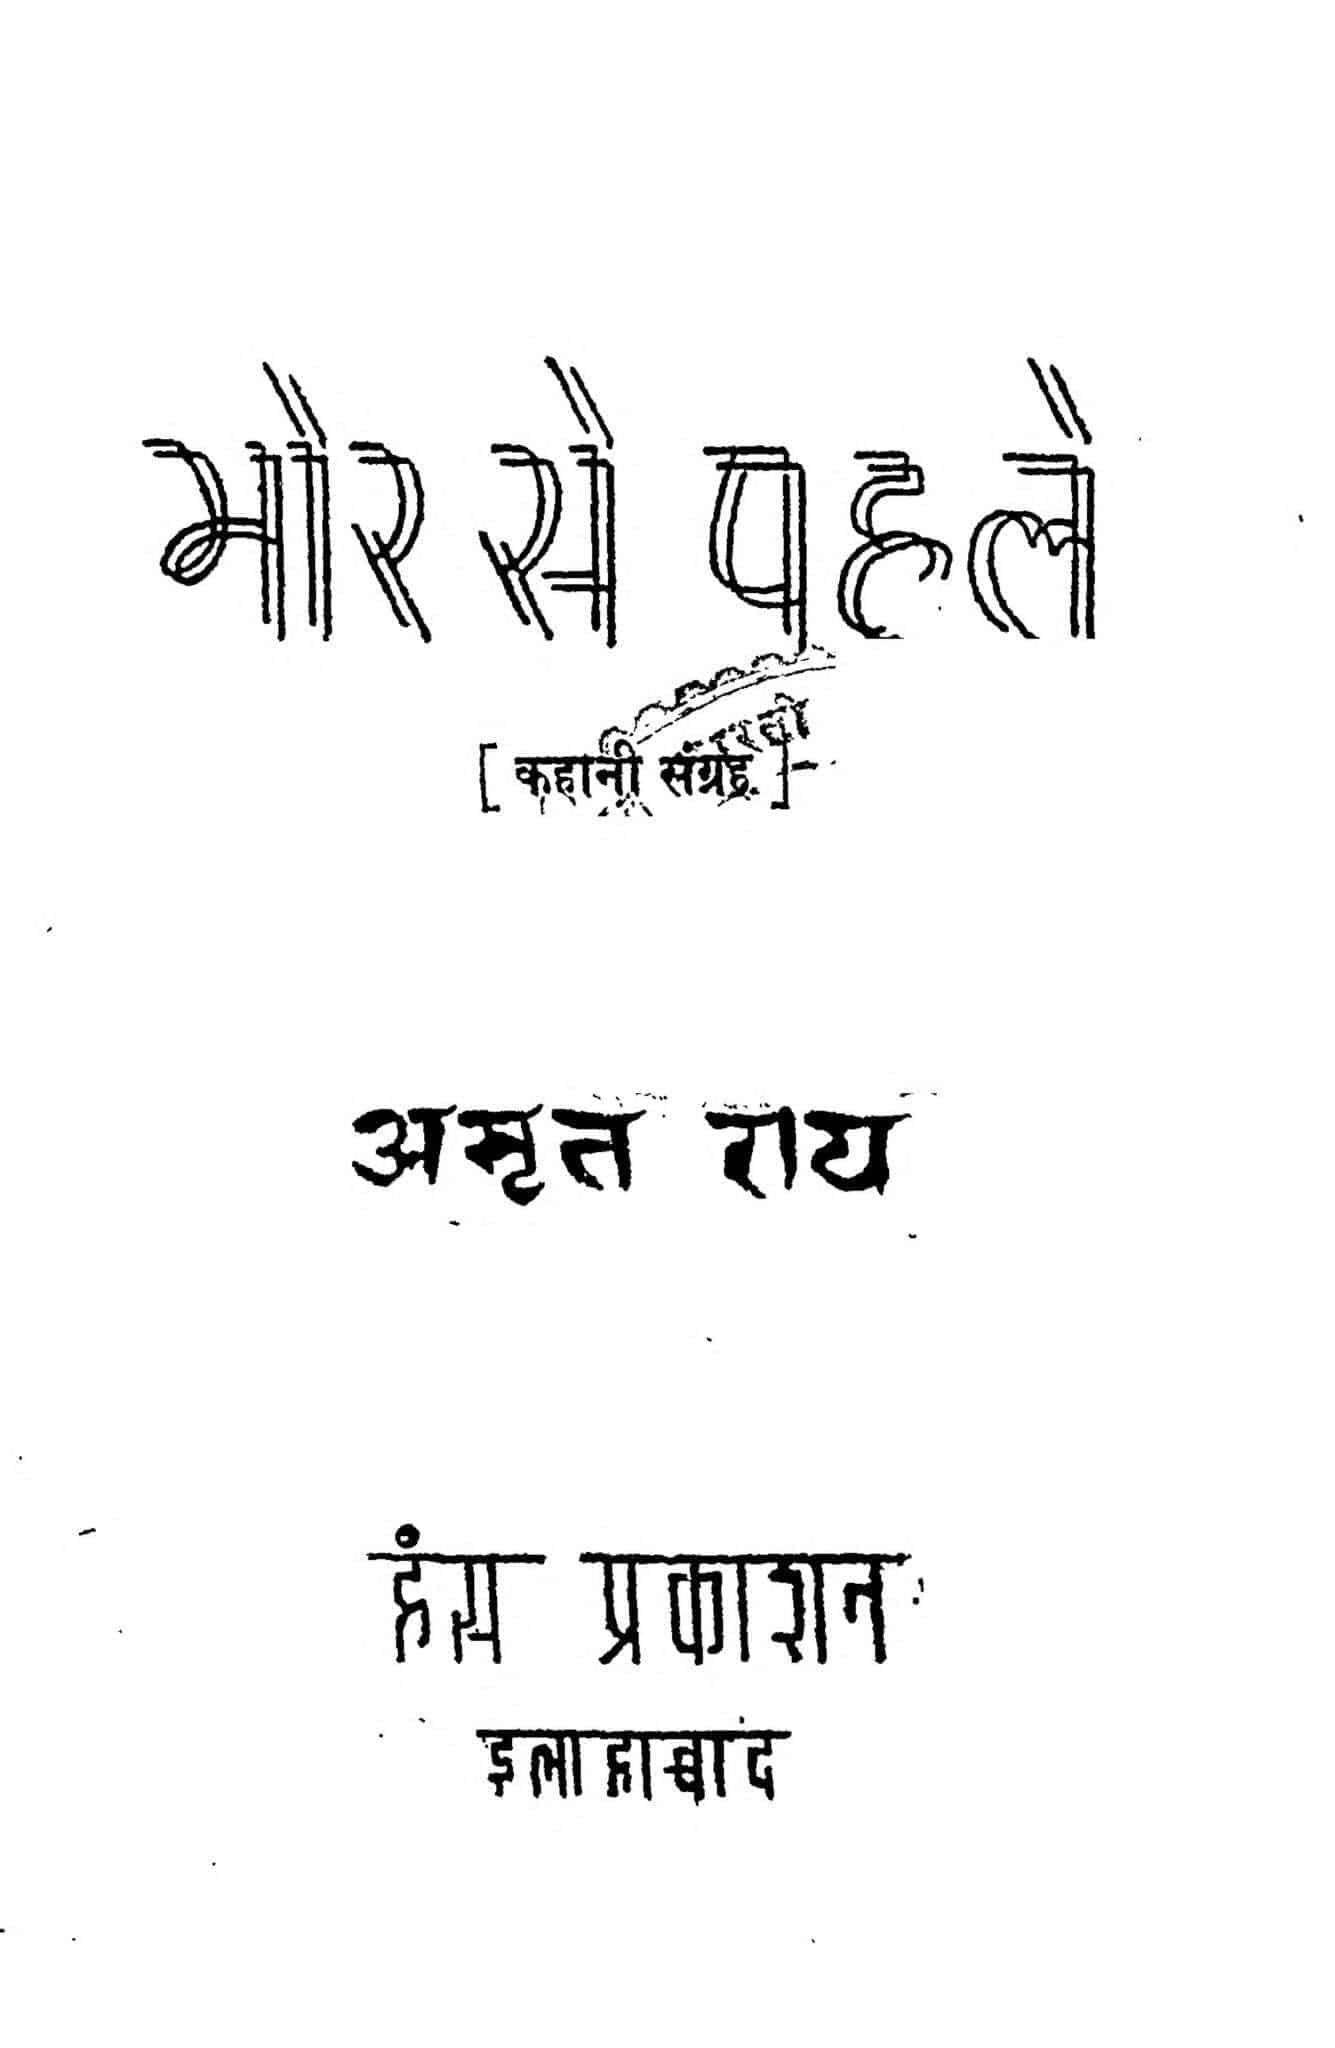 Bhore Se Pahle by अमृत राय - Amrit Rai